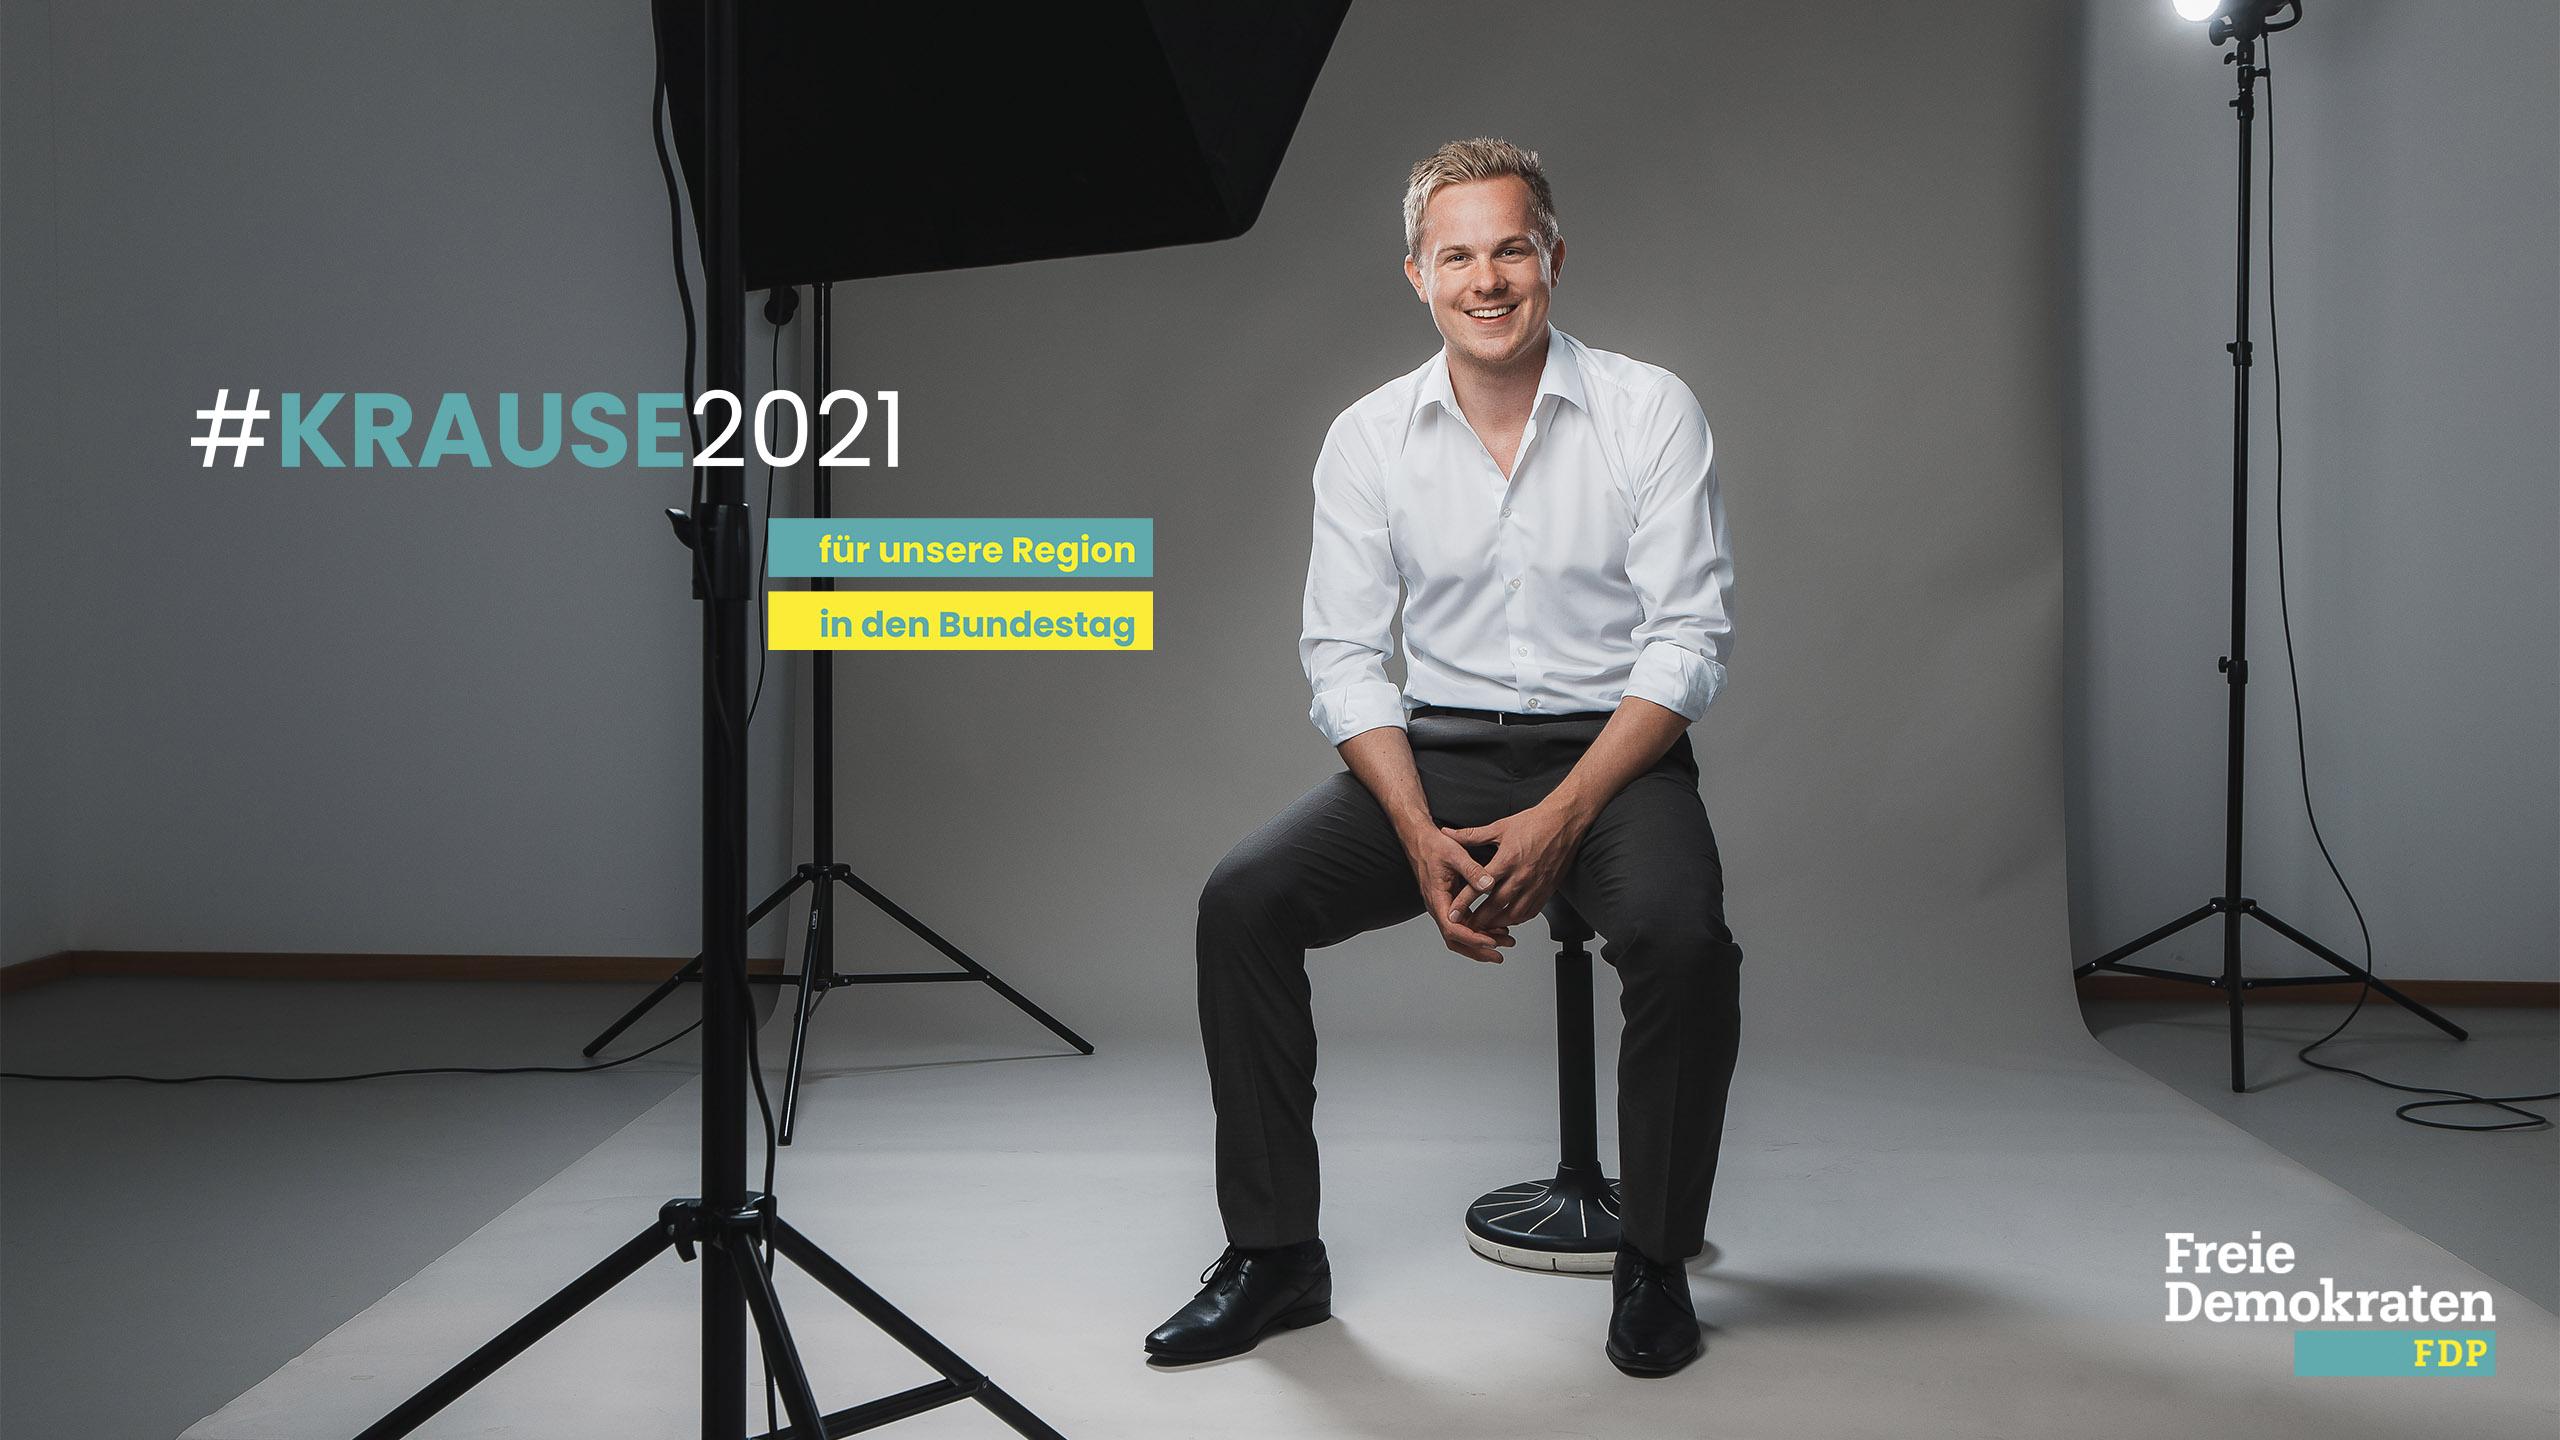 Matthias Krause Kandidat der FDP